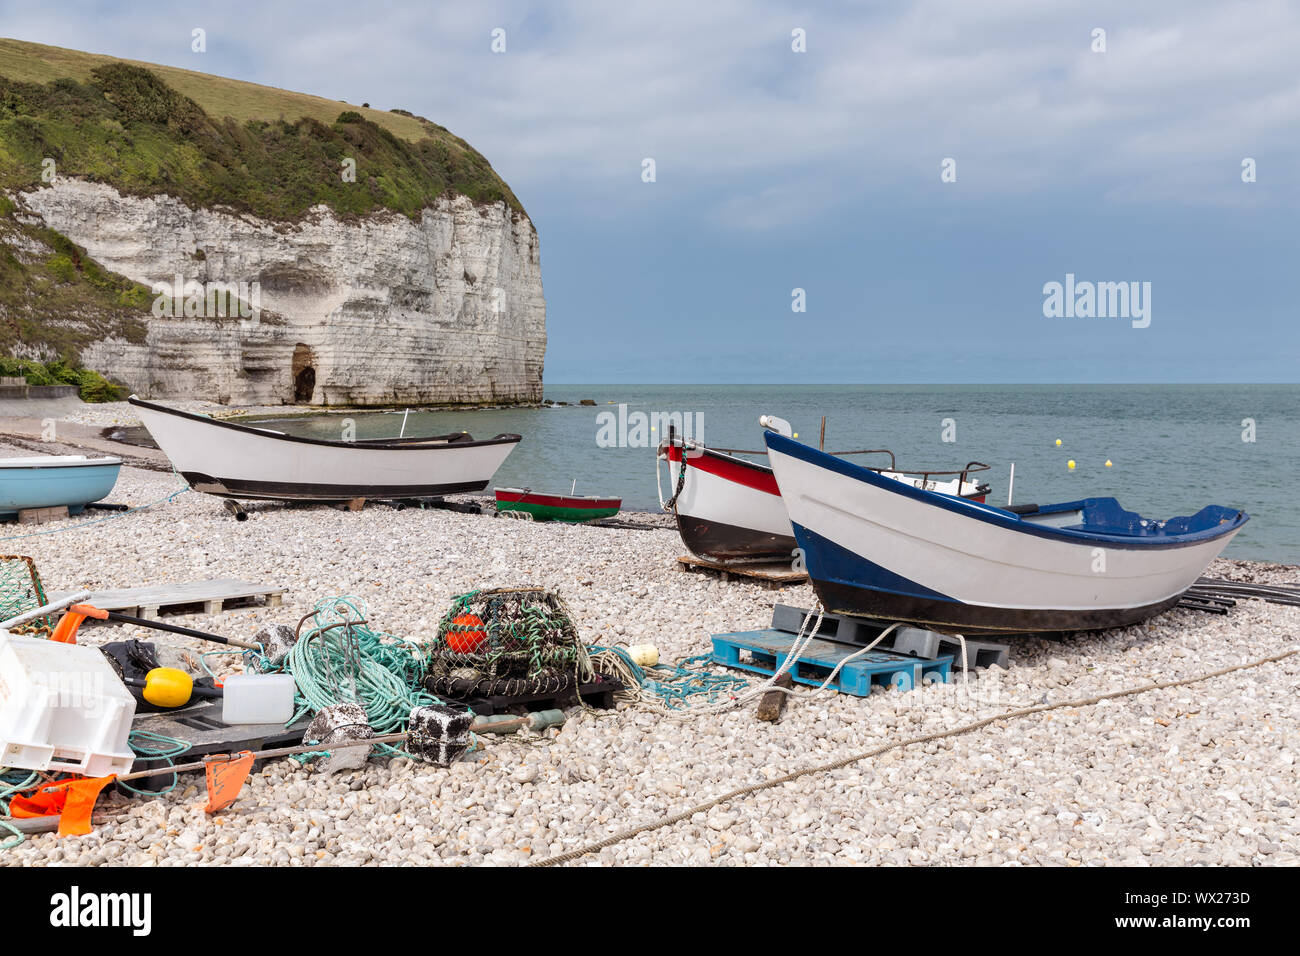 Beachy Porte Dentree